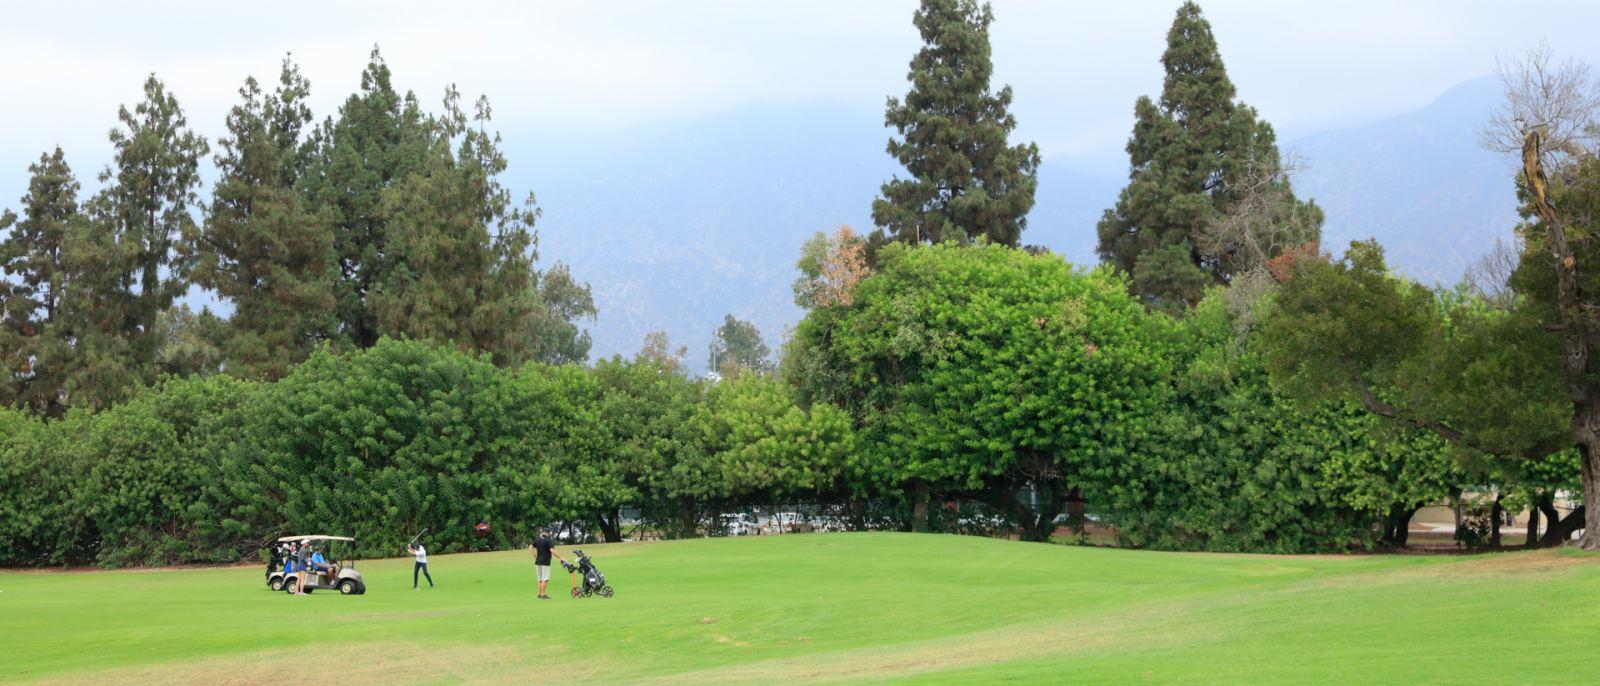 Santa Anita Golf Course golfers